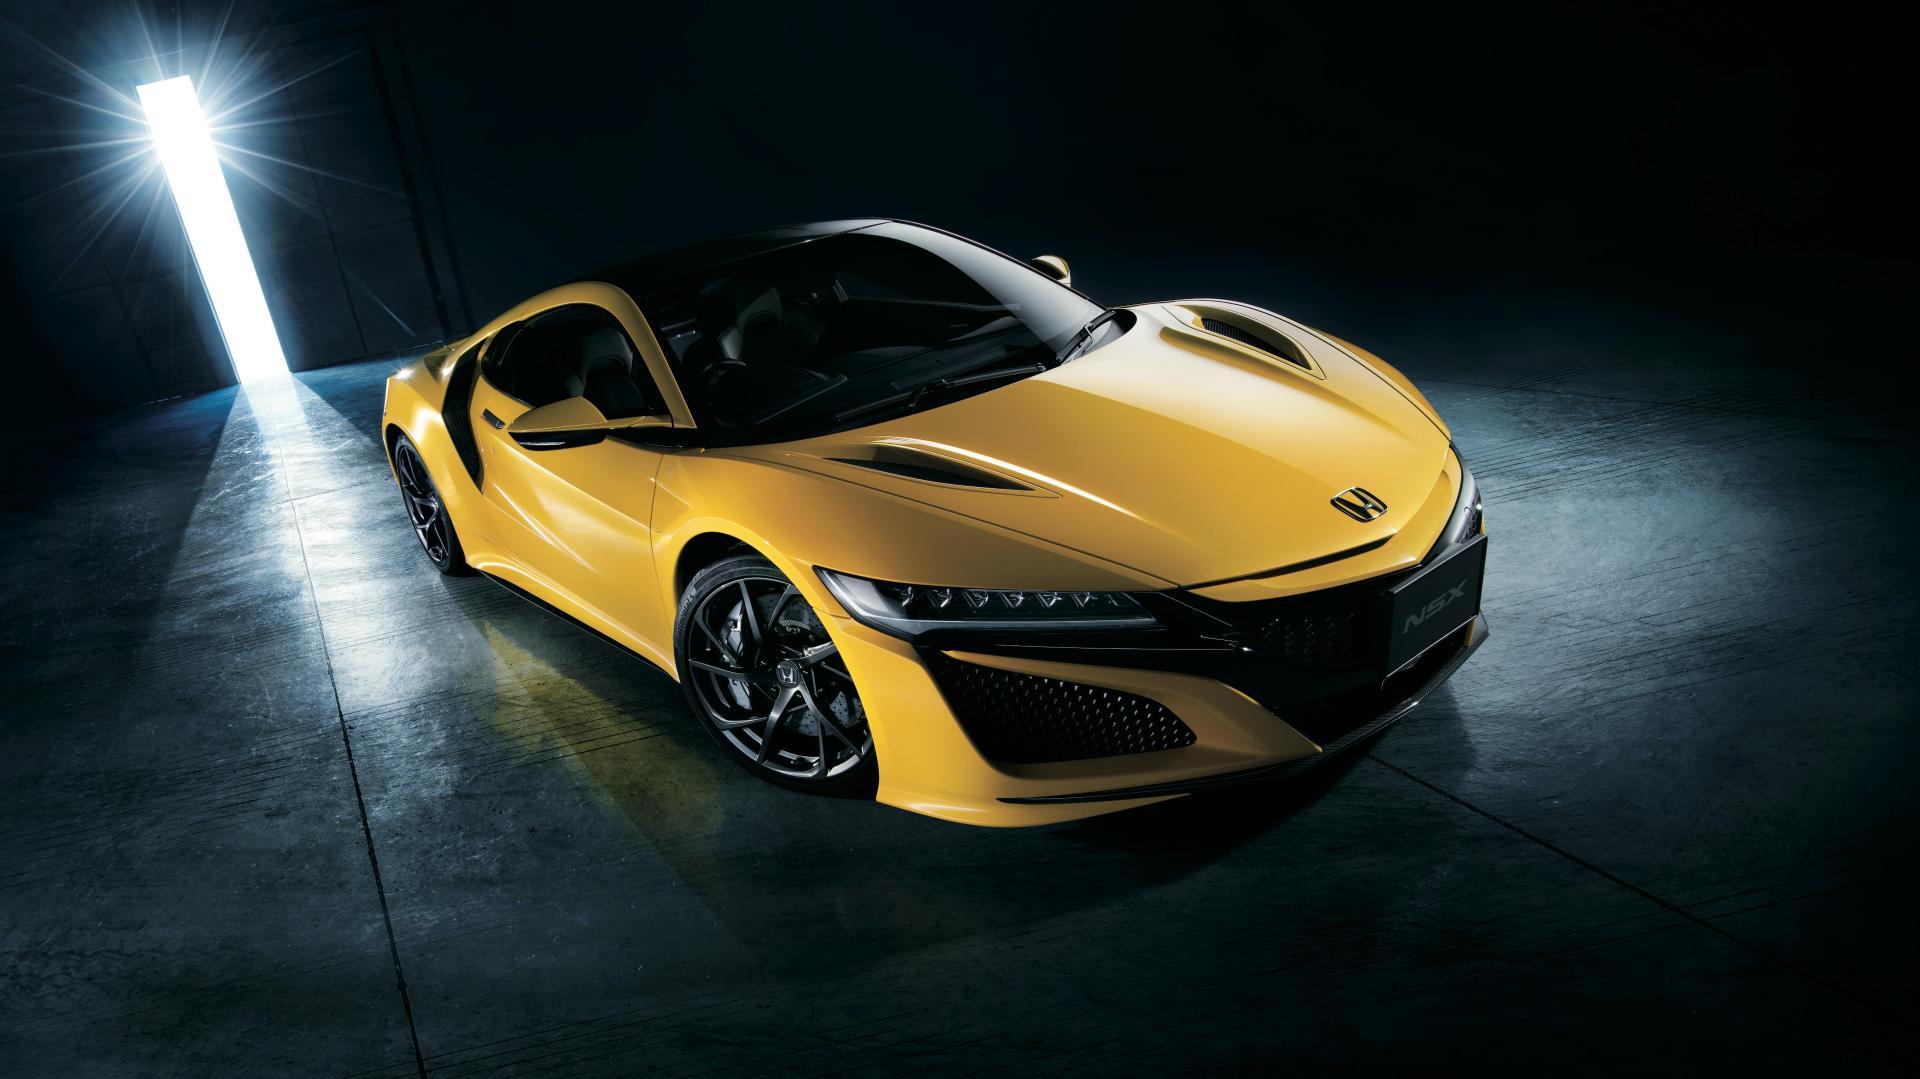 Honda-NSX-in-Indy-Yellow-Pearl-II